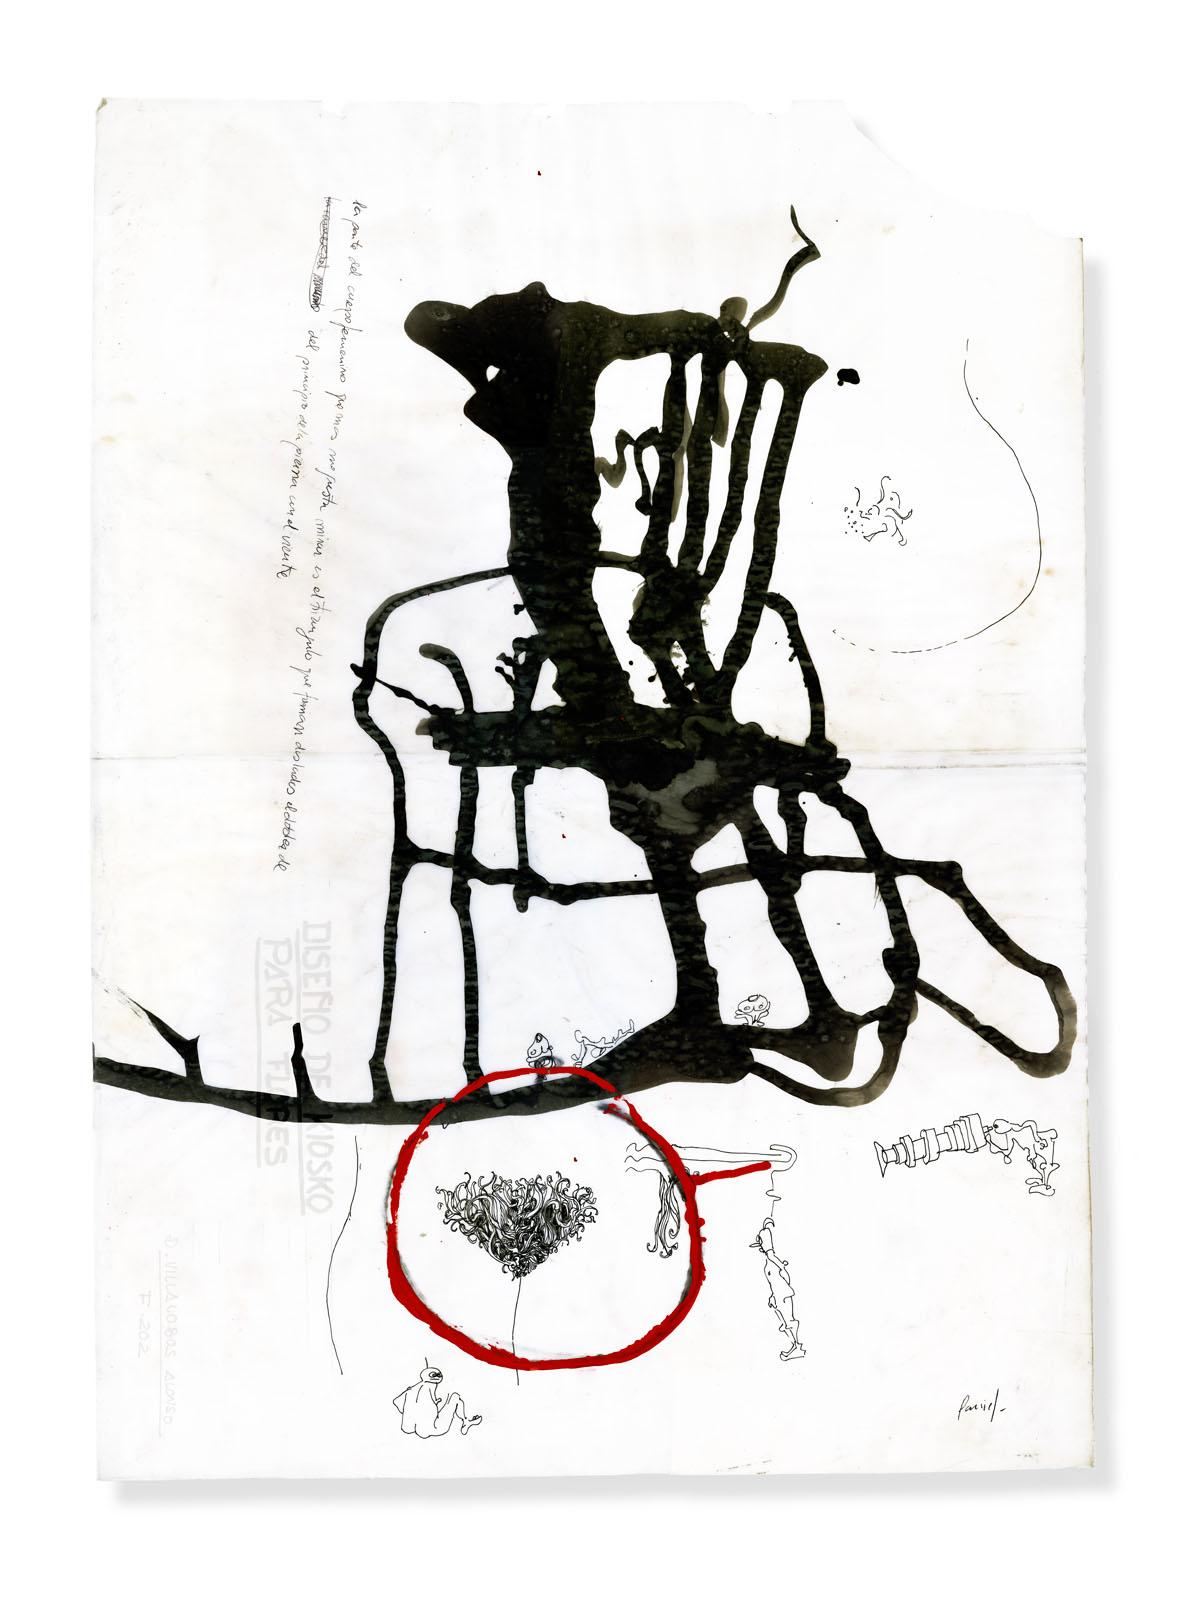 panies-danielvillalobos-spanish-painting-abstractexpressionism-24